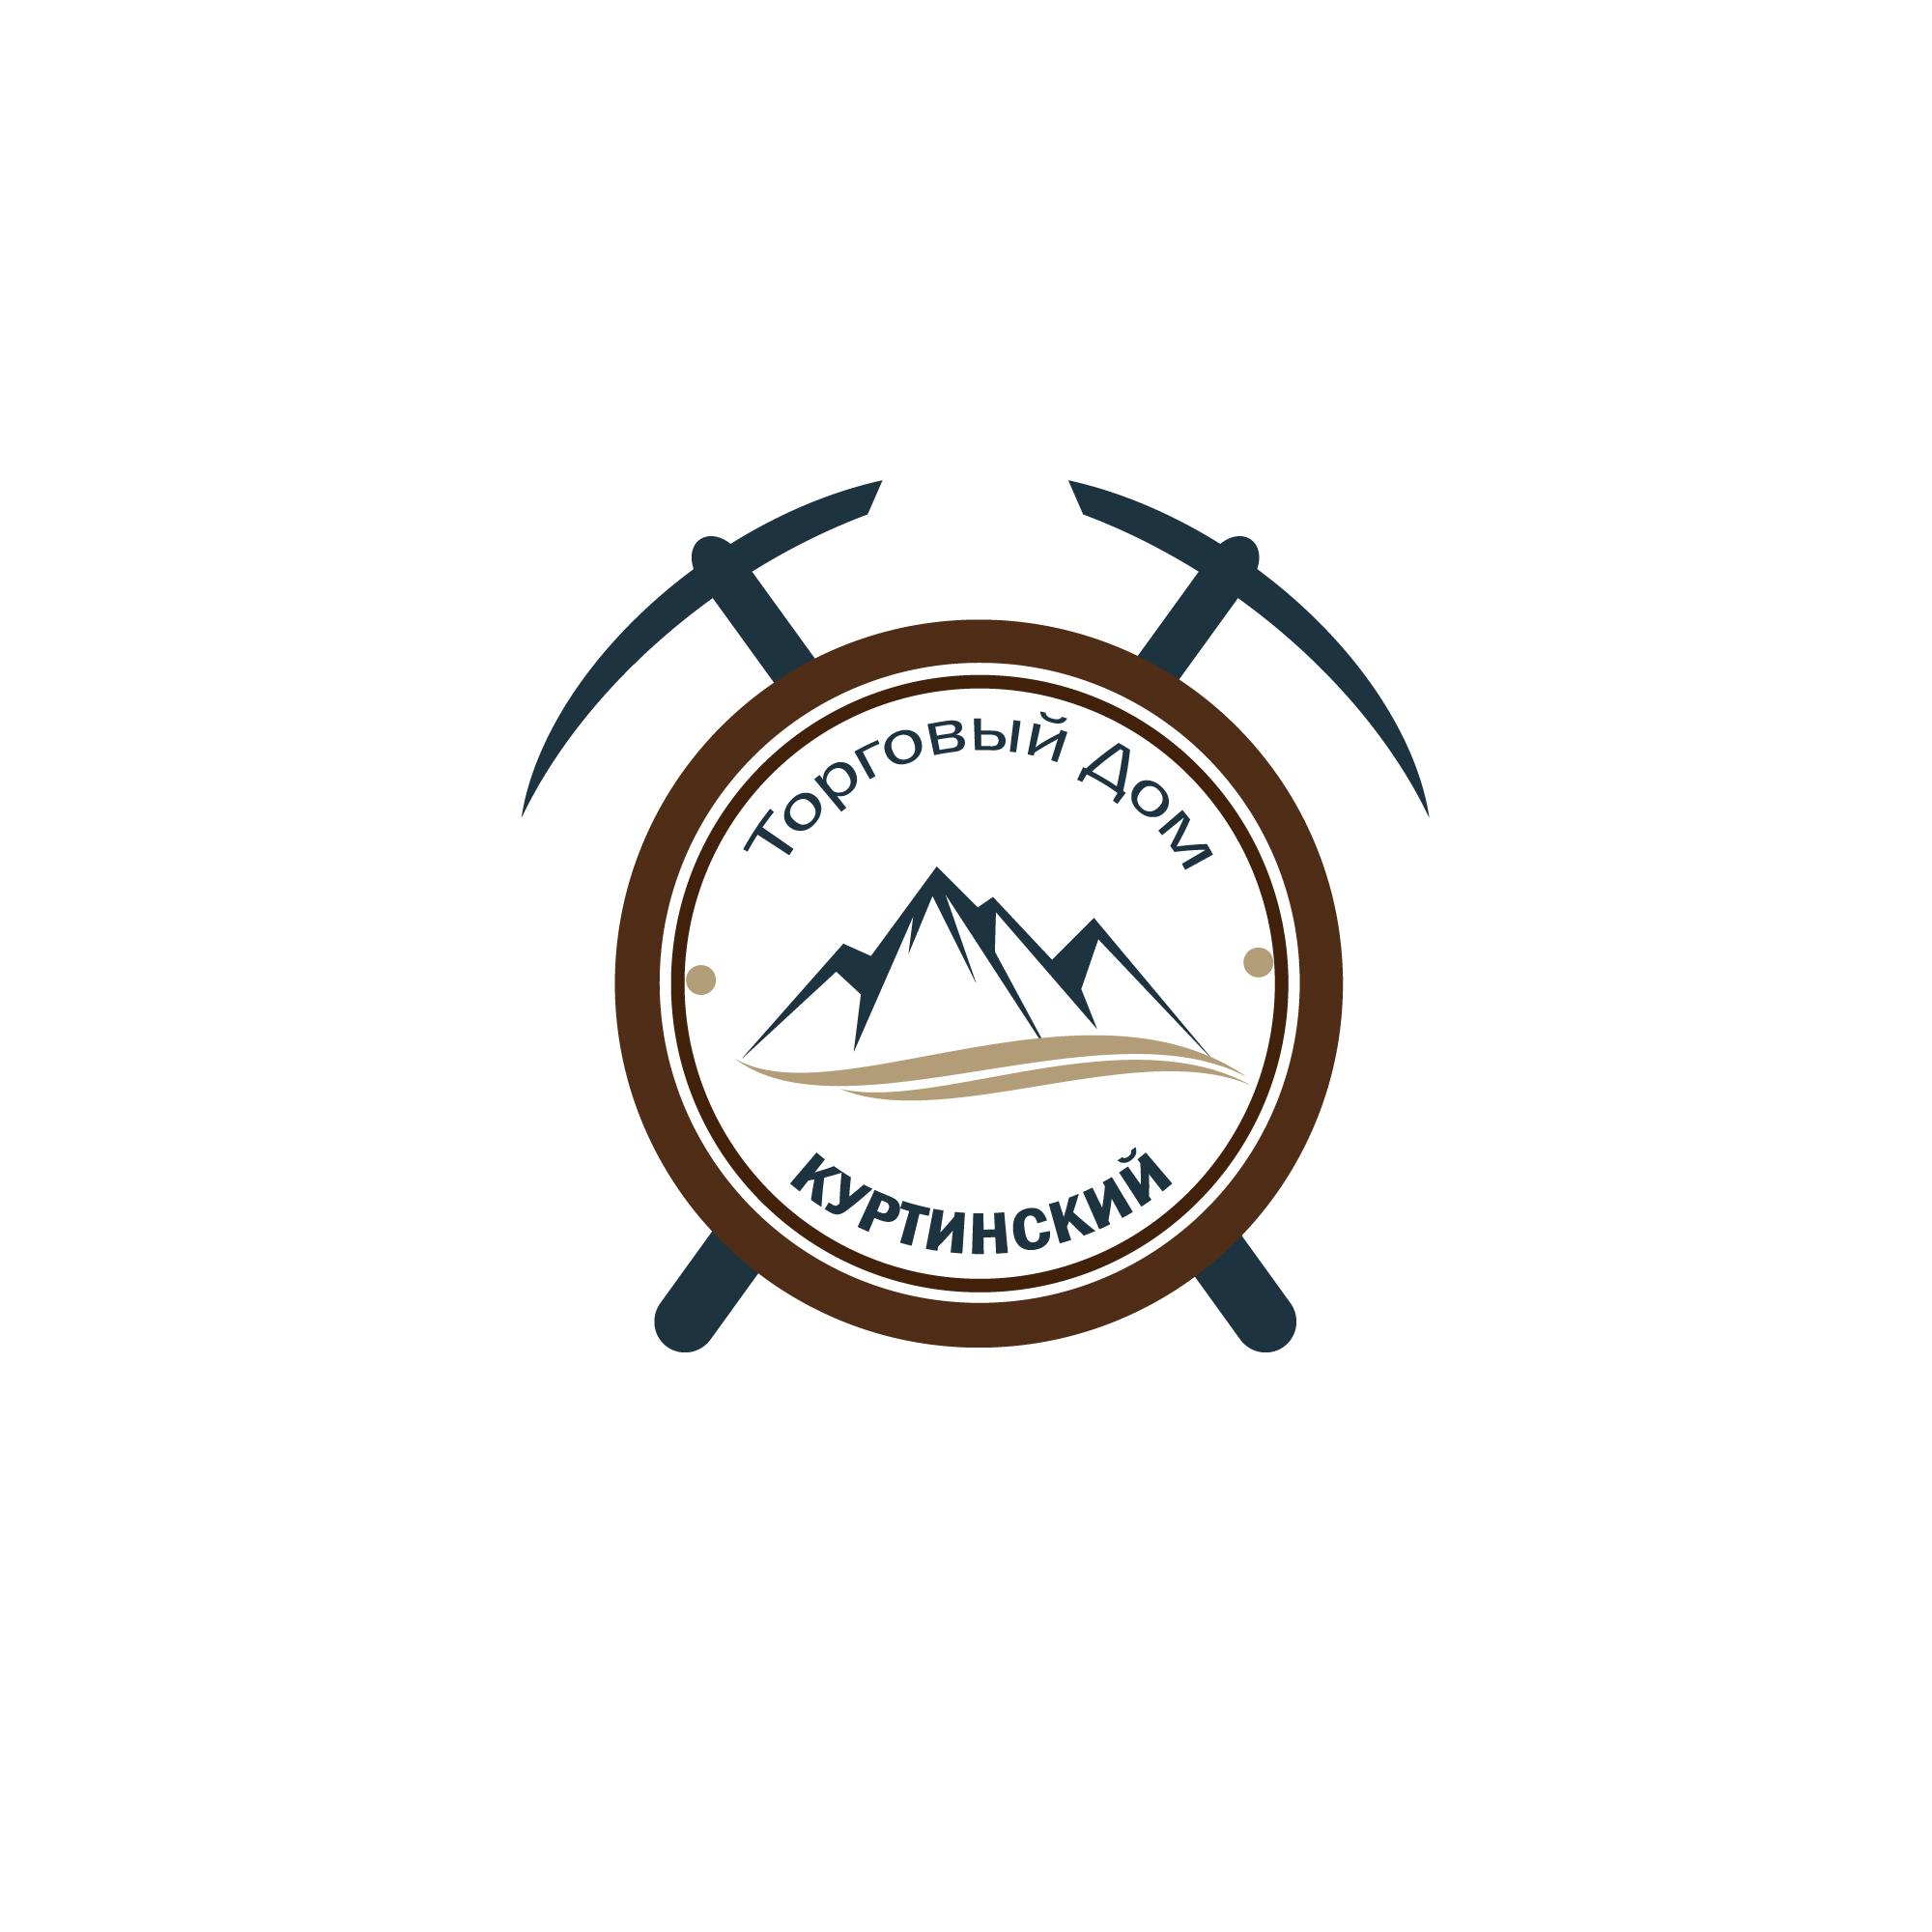 Логотип для камнедобывающей компании фото f_7005b9acd268dcb2.jpg